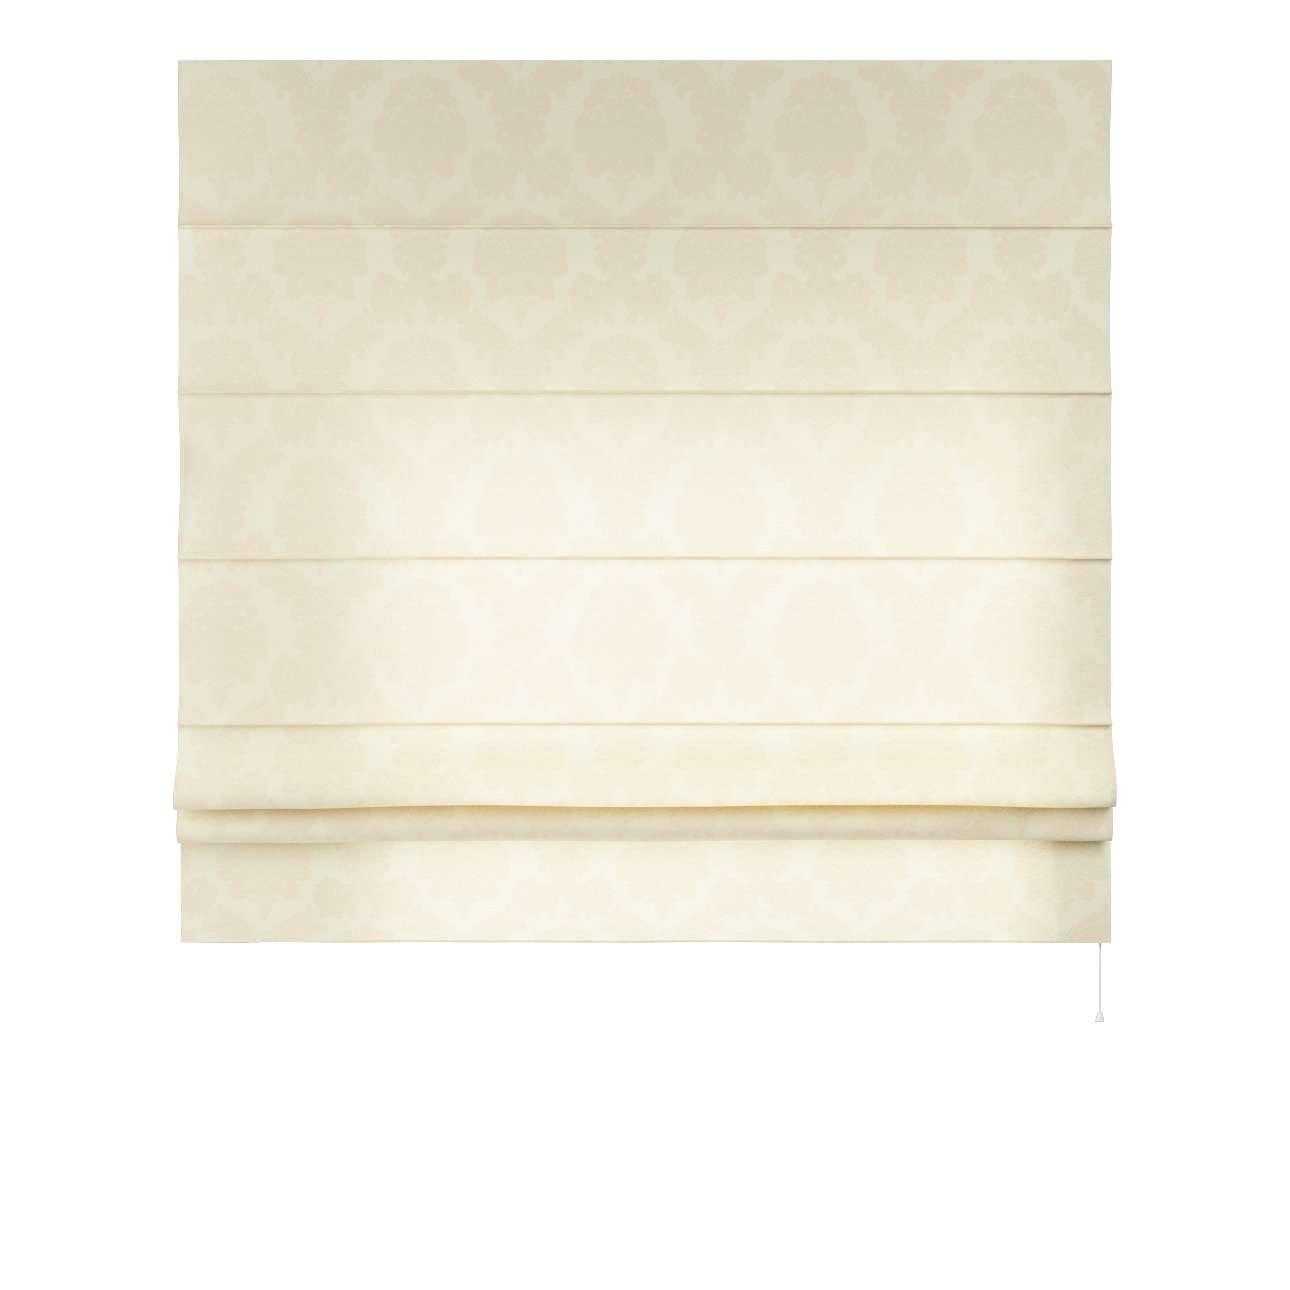 Padva roman blind  80 x 170 cm (31.5 x 67 inch) in collection Damasco, fabric: 613-01